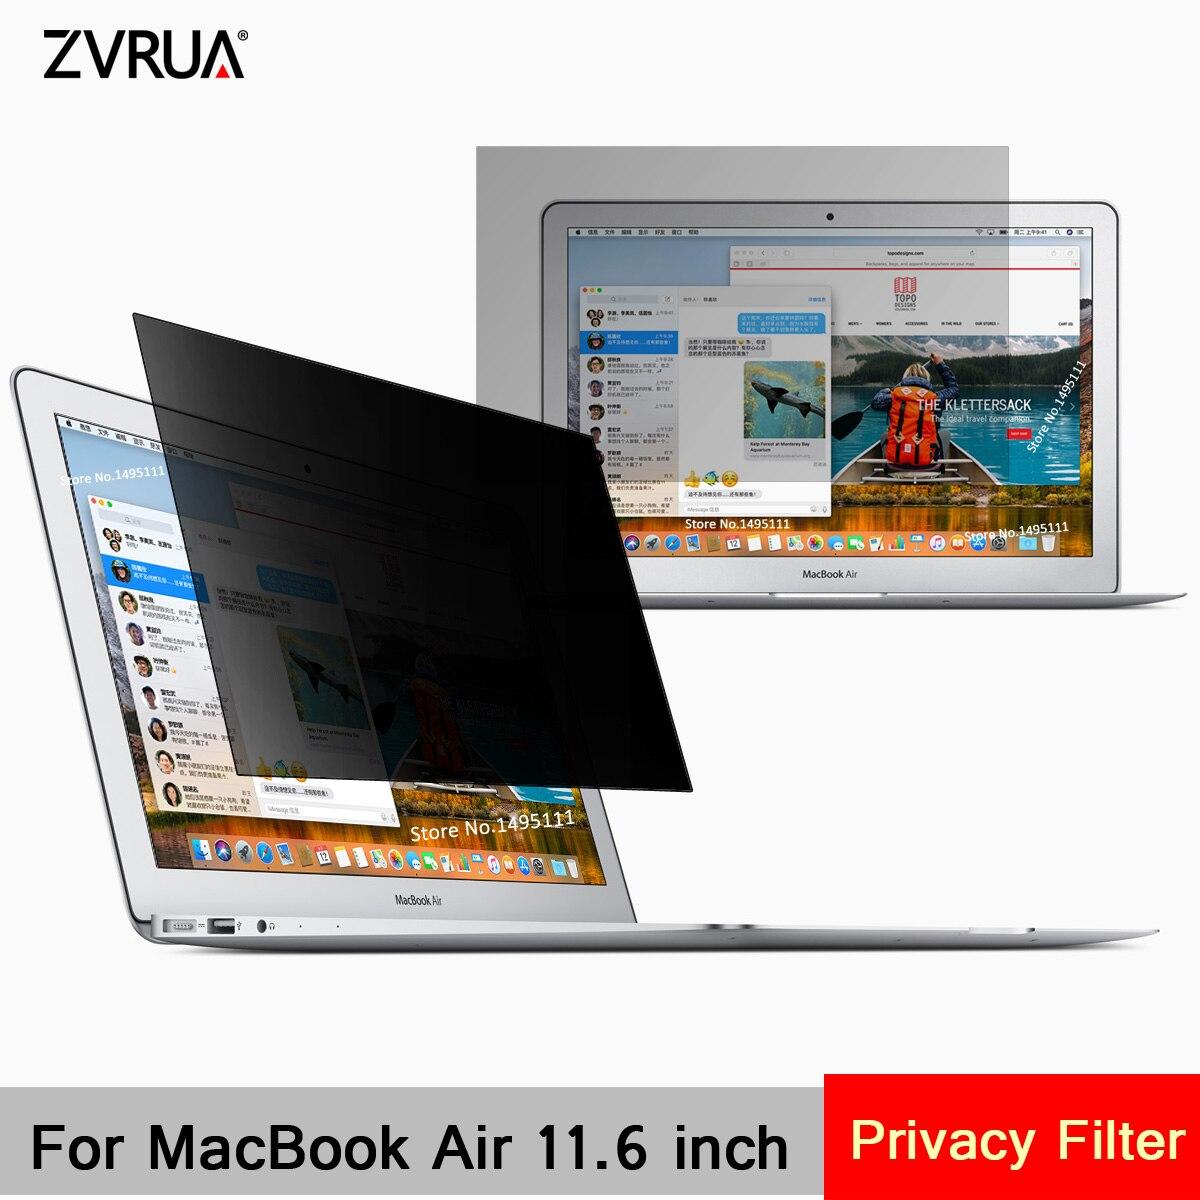 Für Apple Macbook Air 11,6 Zoll (256mm * 144mm) Privatsphäre Filter Laptop Notebook Anti-glare Screen Protector Schutz Film 100% Original